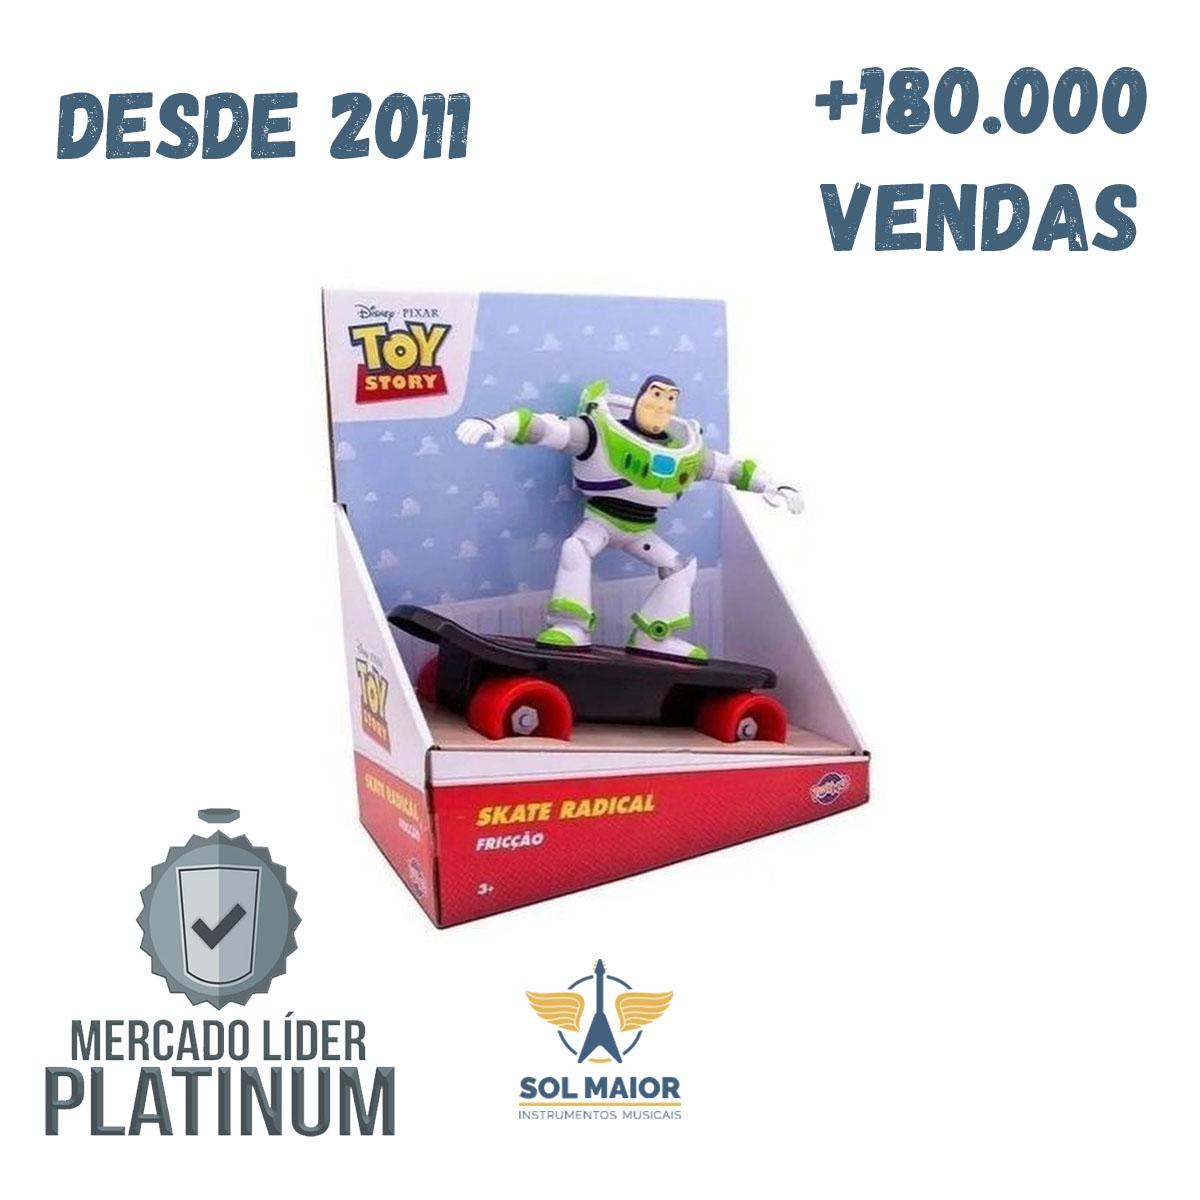 Skate Fricção Toy Story Com Buzz Lightyear Toyng 34066